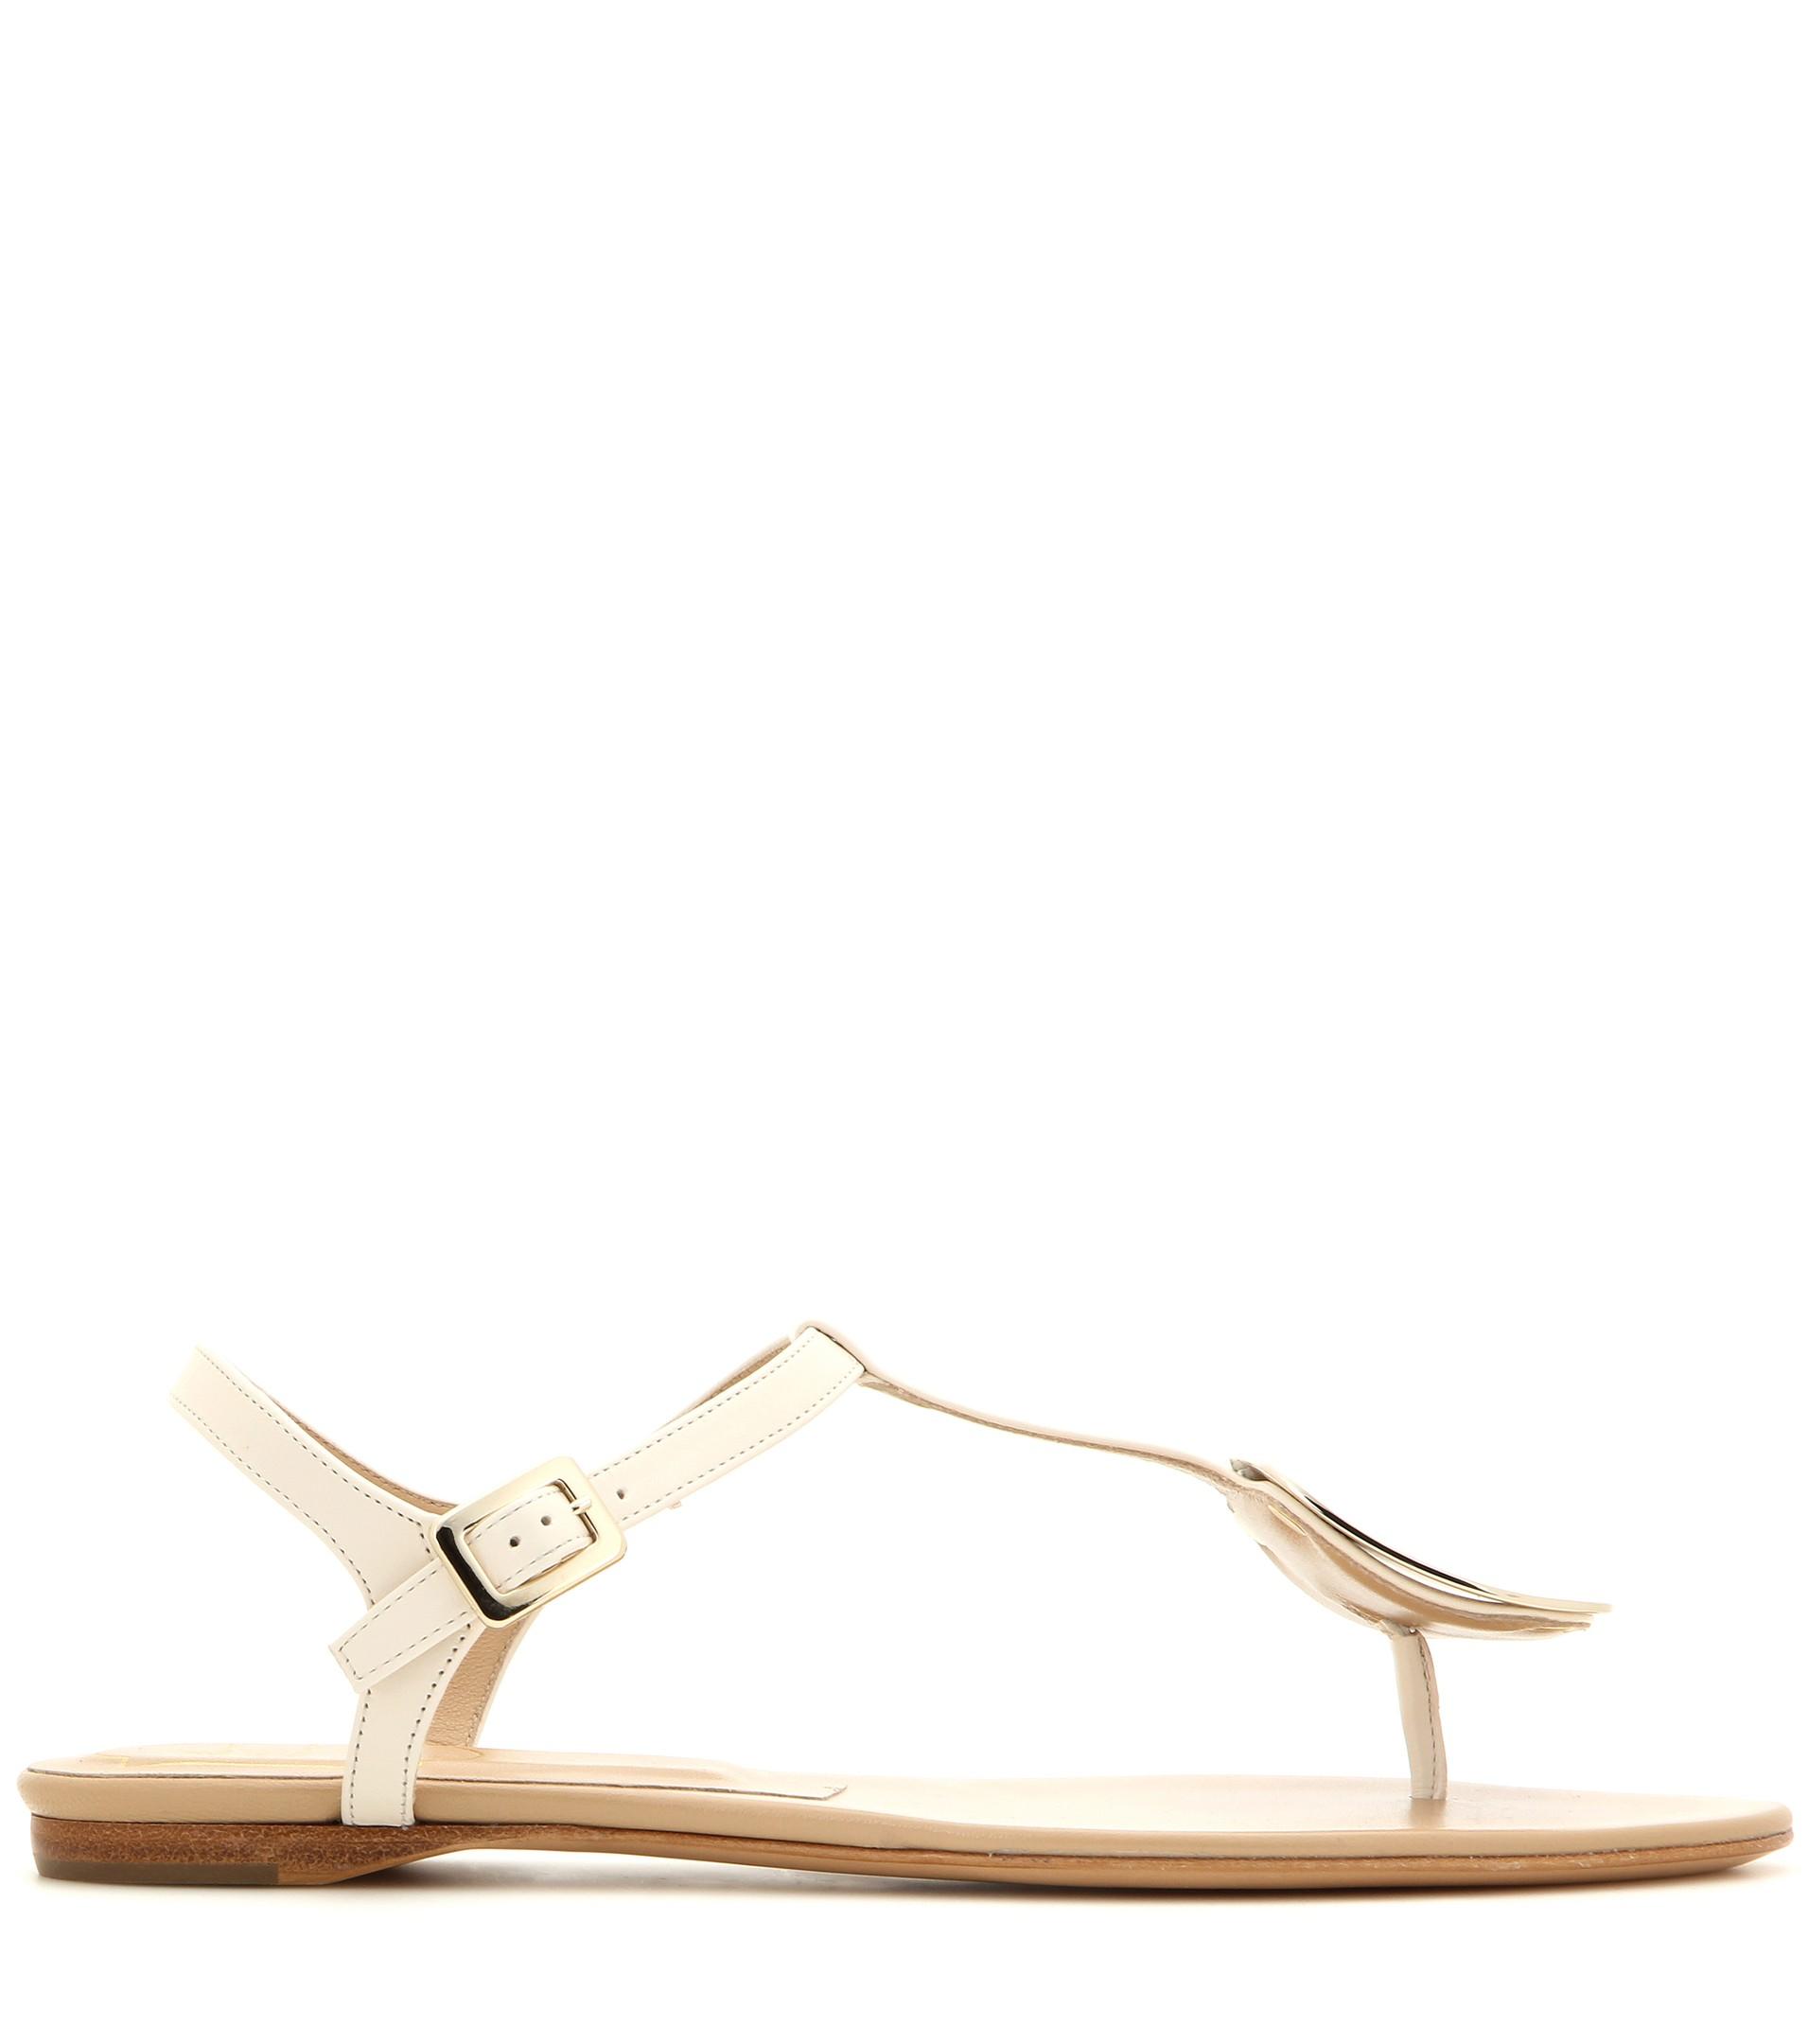 a7f0d1dbbf90af Lyst - Roger Vivier Thong Chips Leather Sandals in Natural